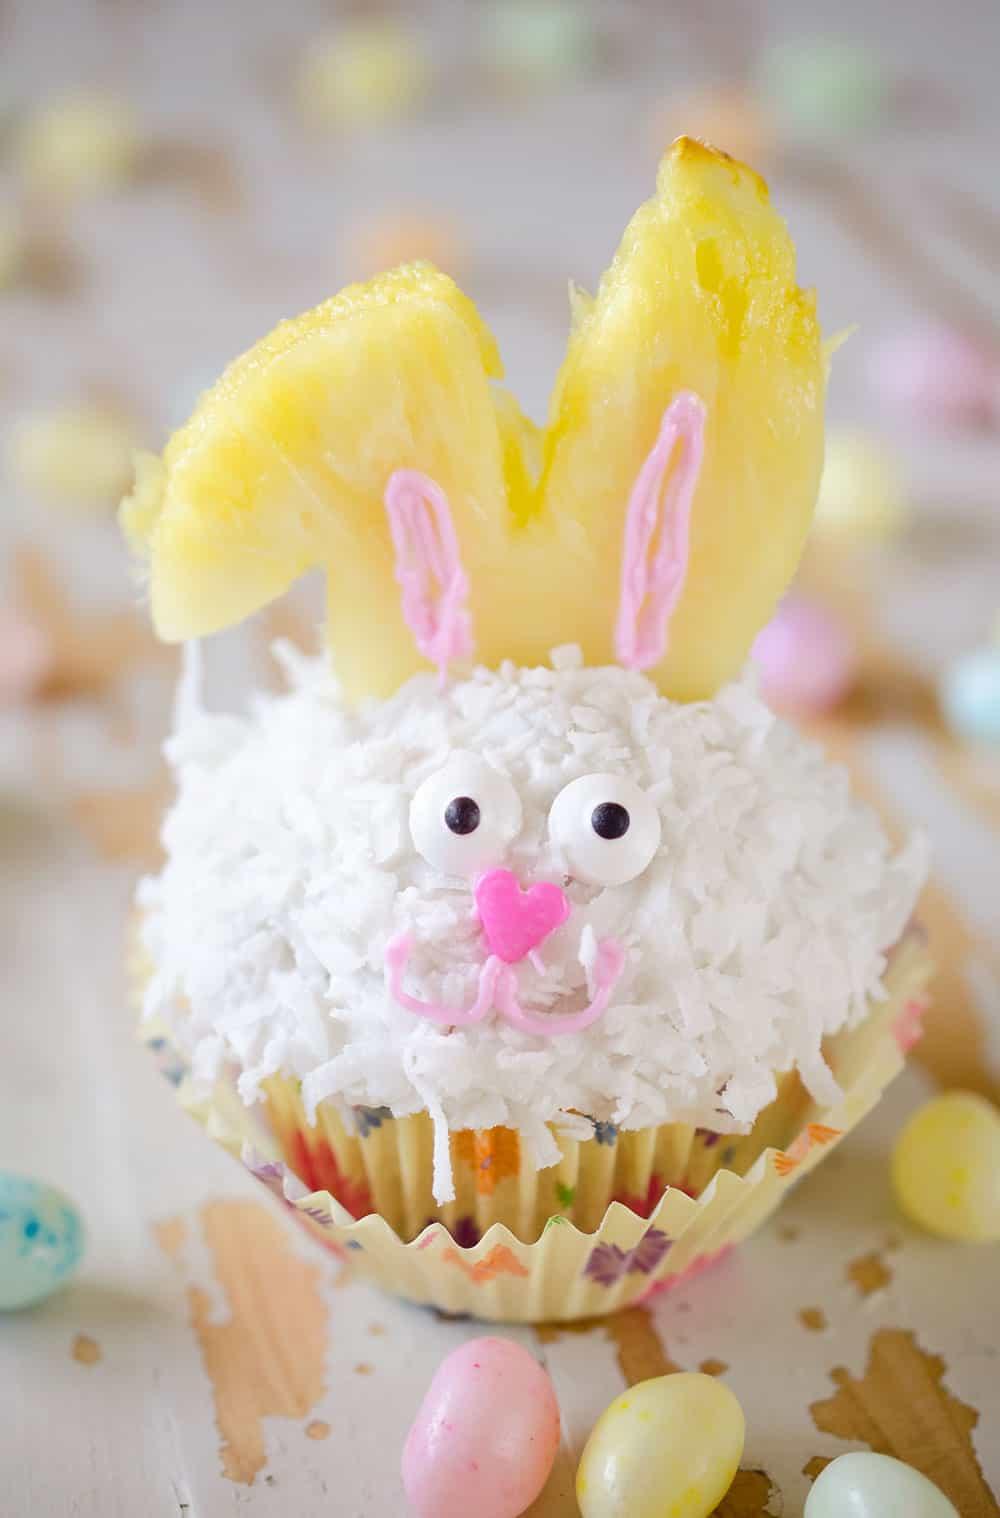 Light Coconut Cream Easter Bunny Cupcakes - The Creative Bite